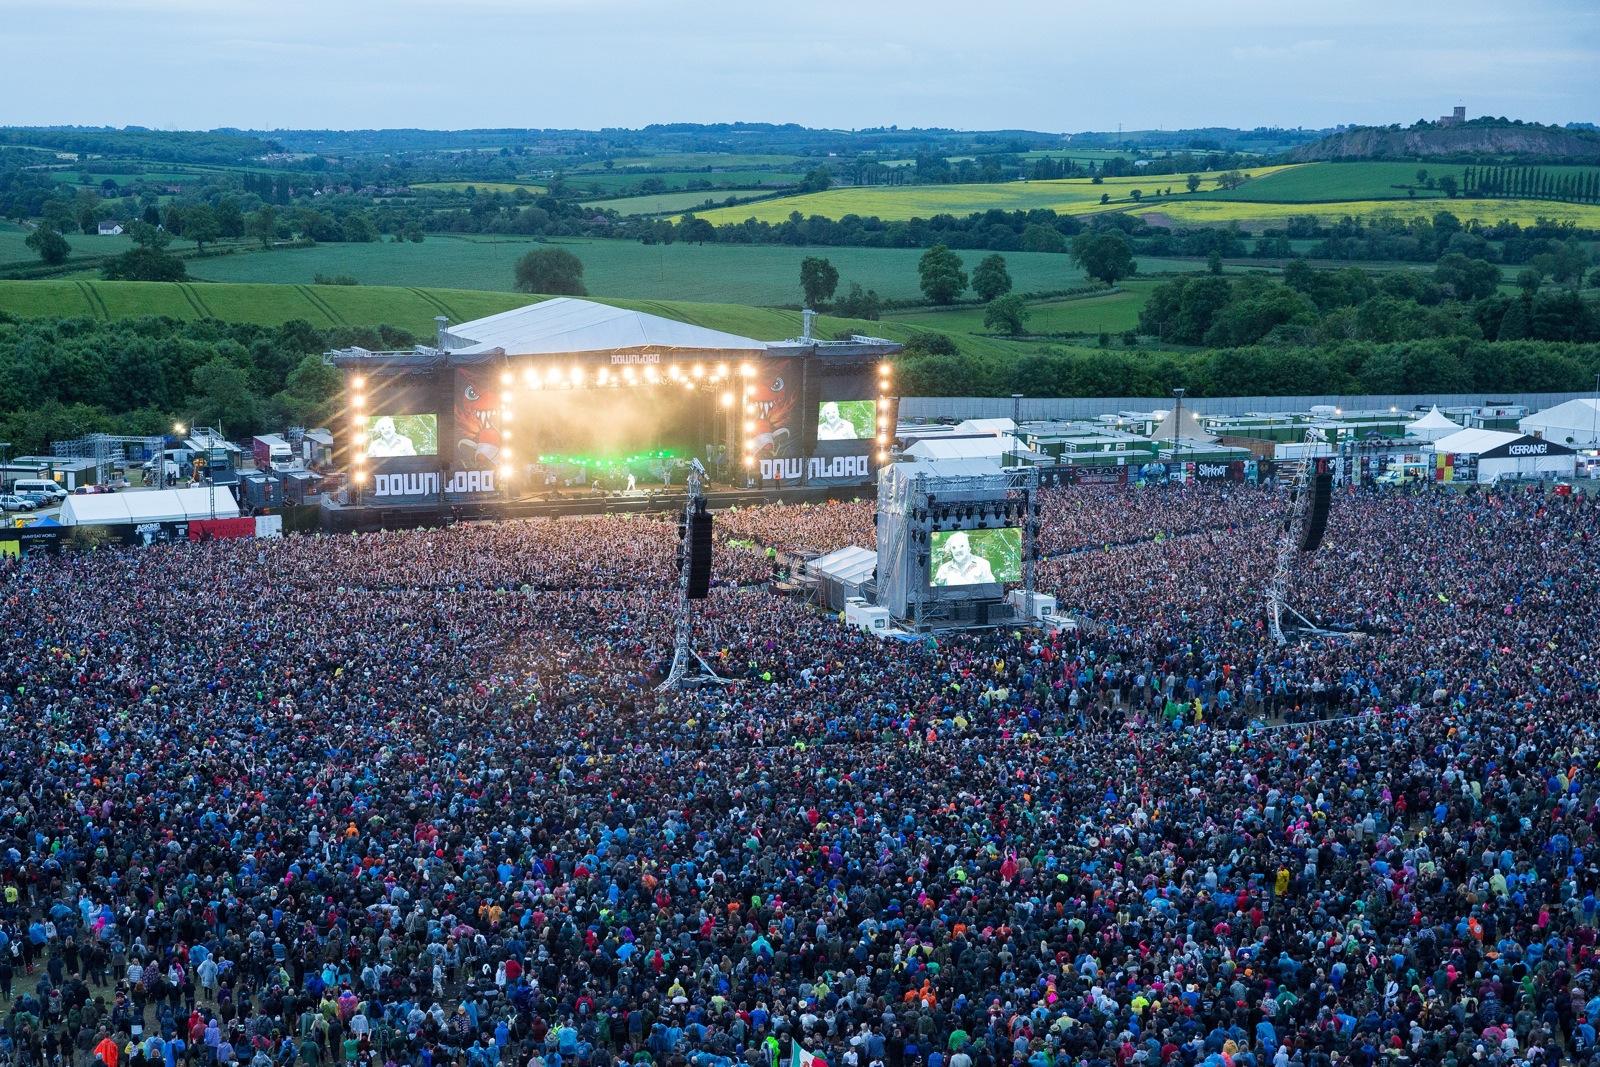 2019 download festival